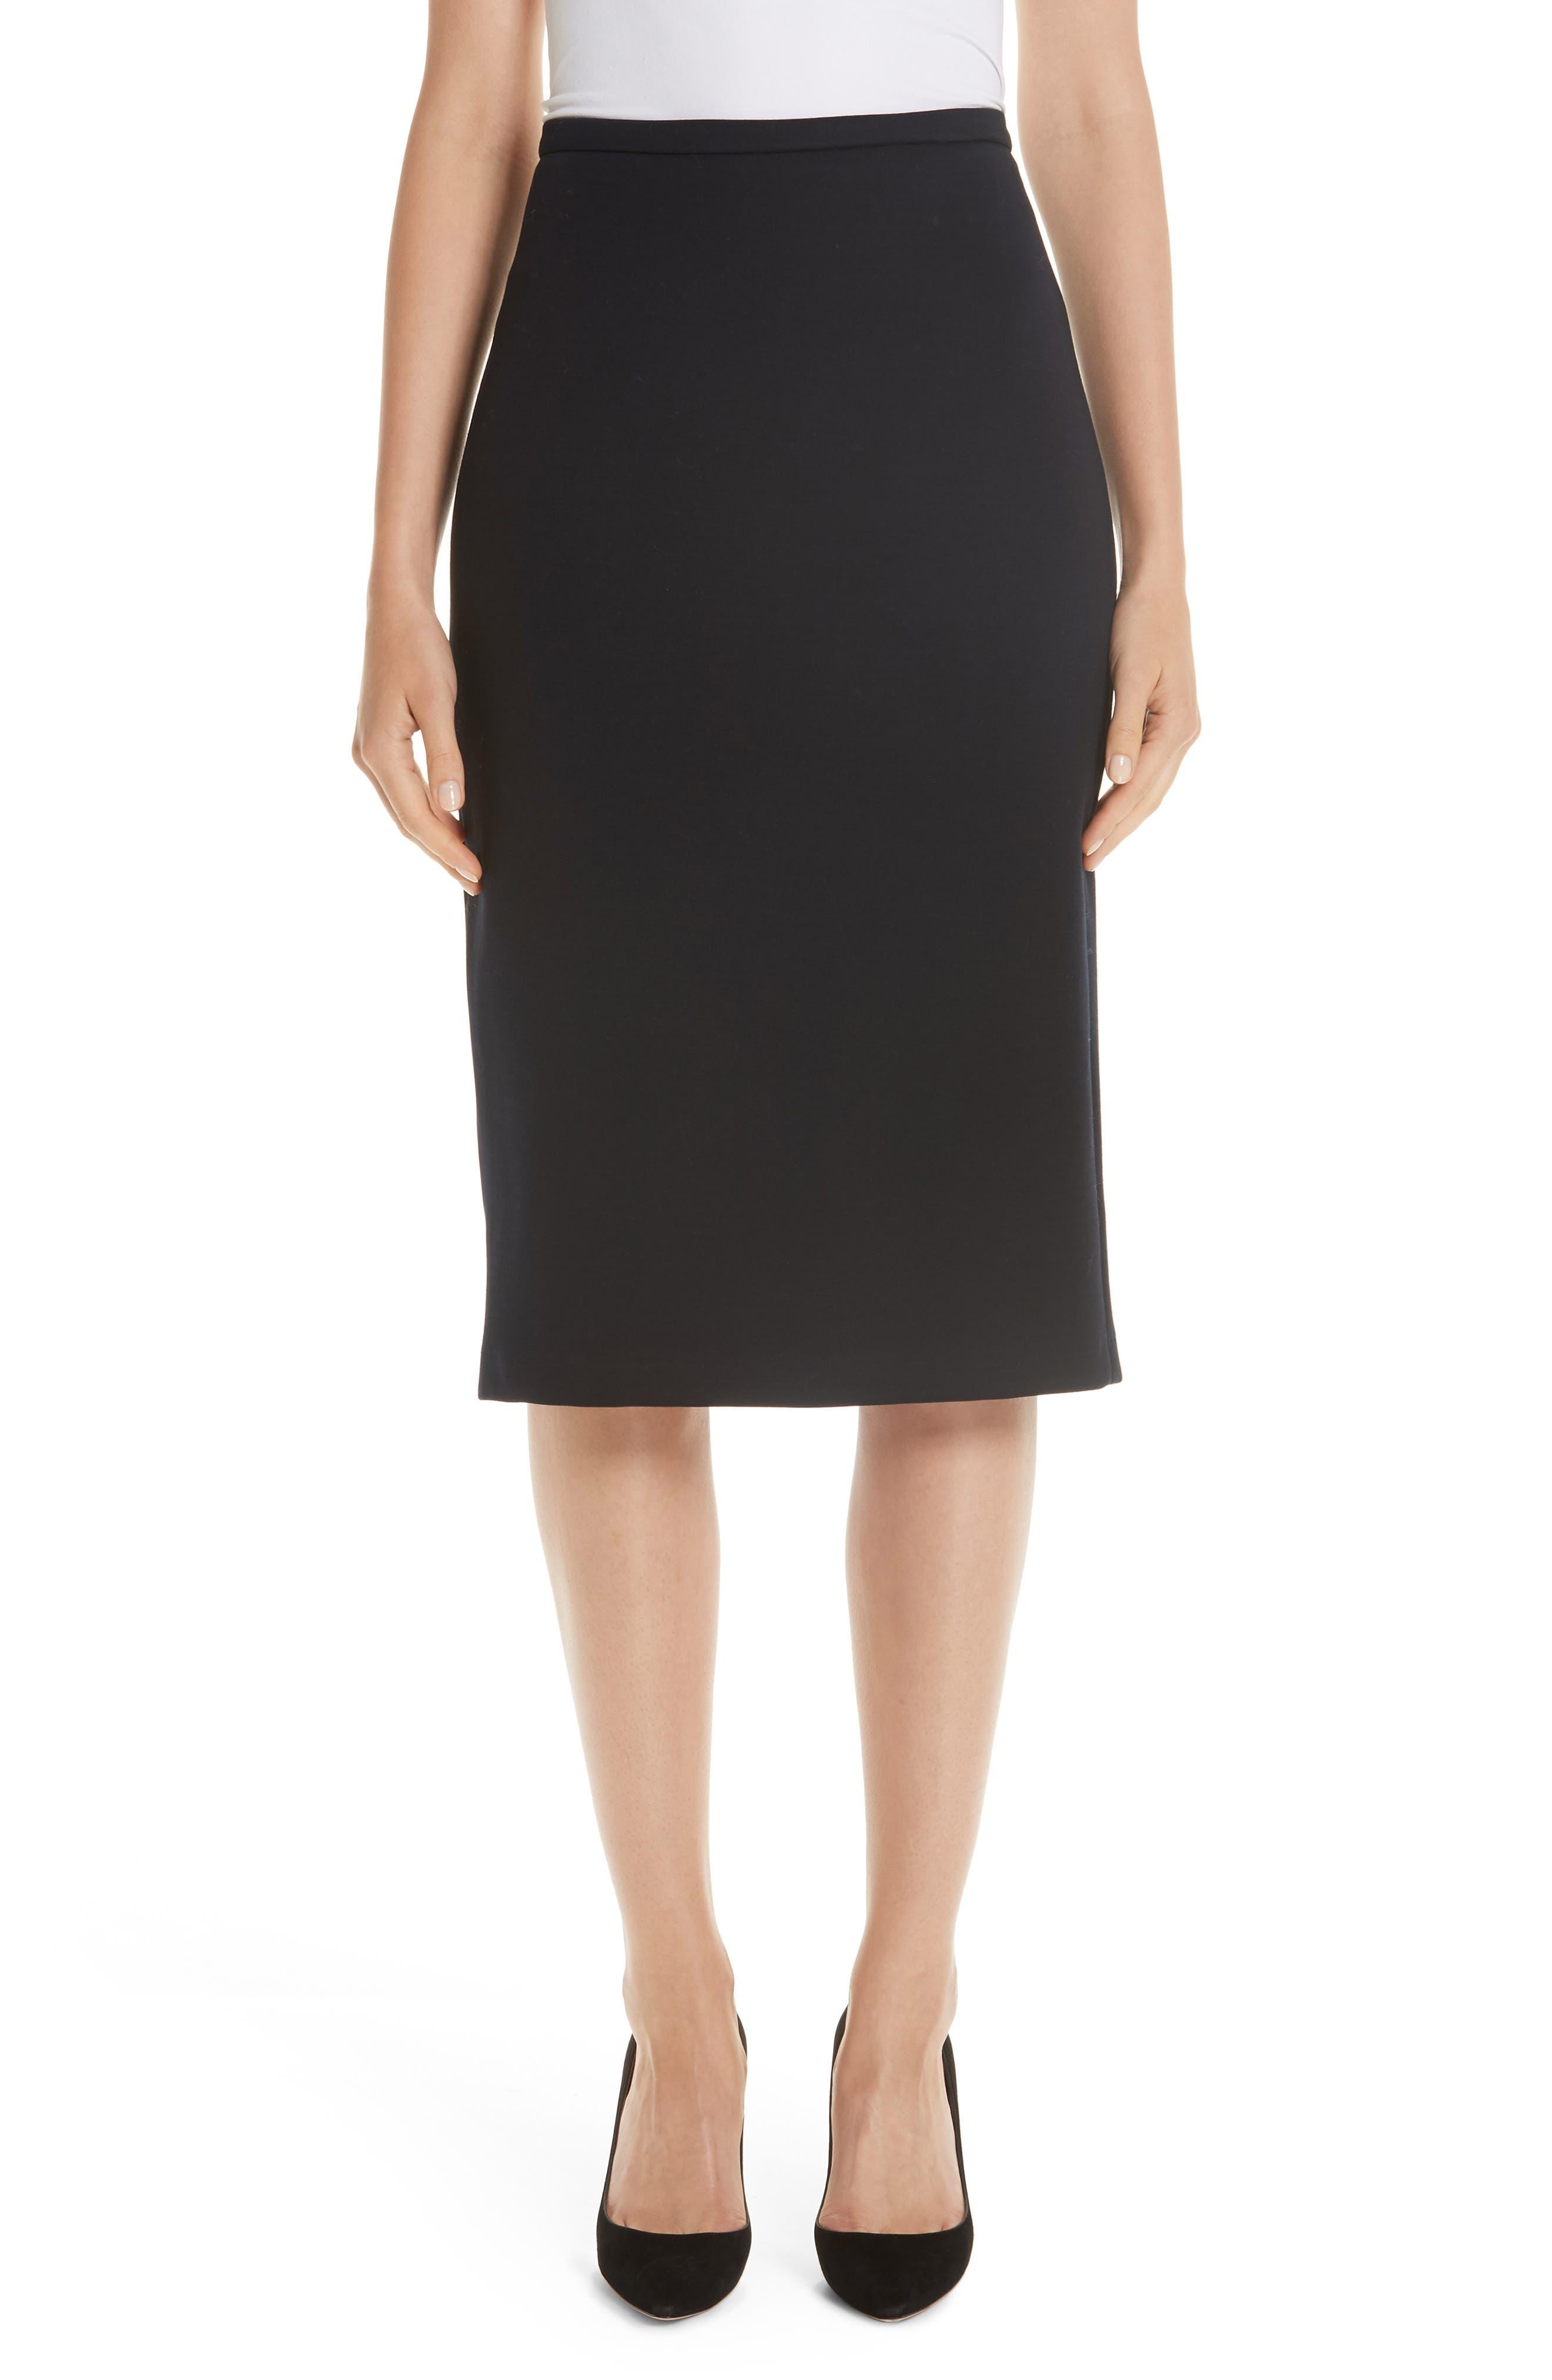 Egeria Knit Pencil Skirt in Ultramarine